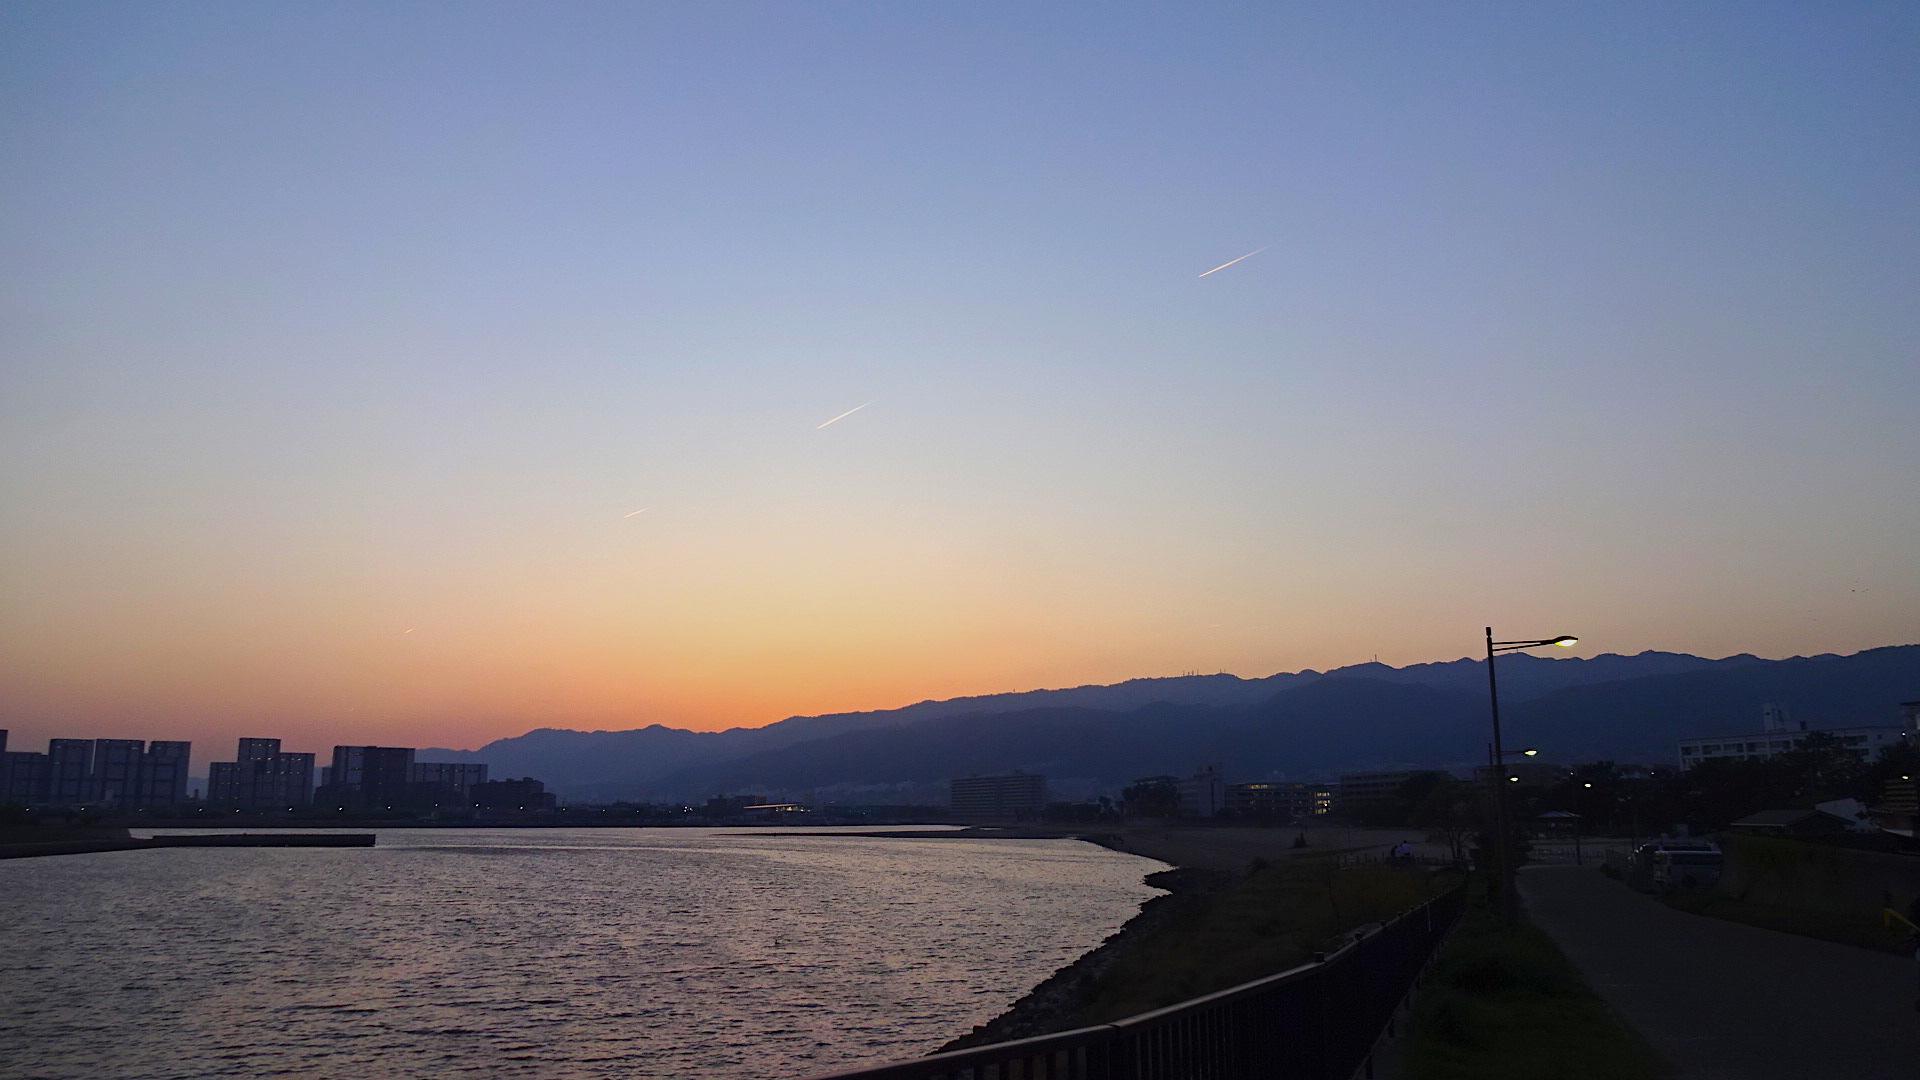 https://cdn-ak.f.st-hatena.com/images/fotolife/s/shioshiohida/20180421/20180421183542_original.jpg